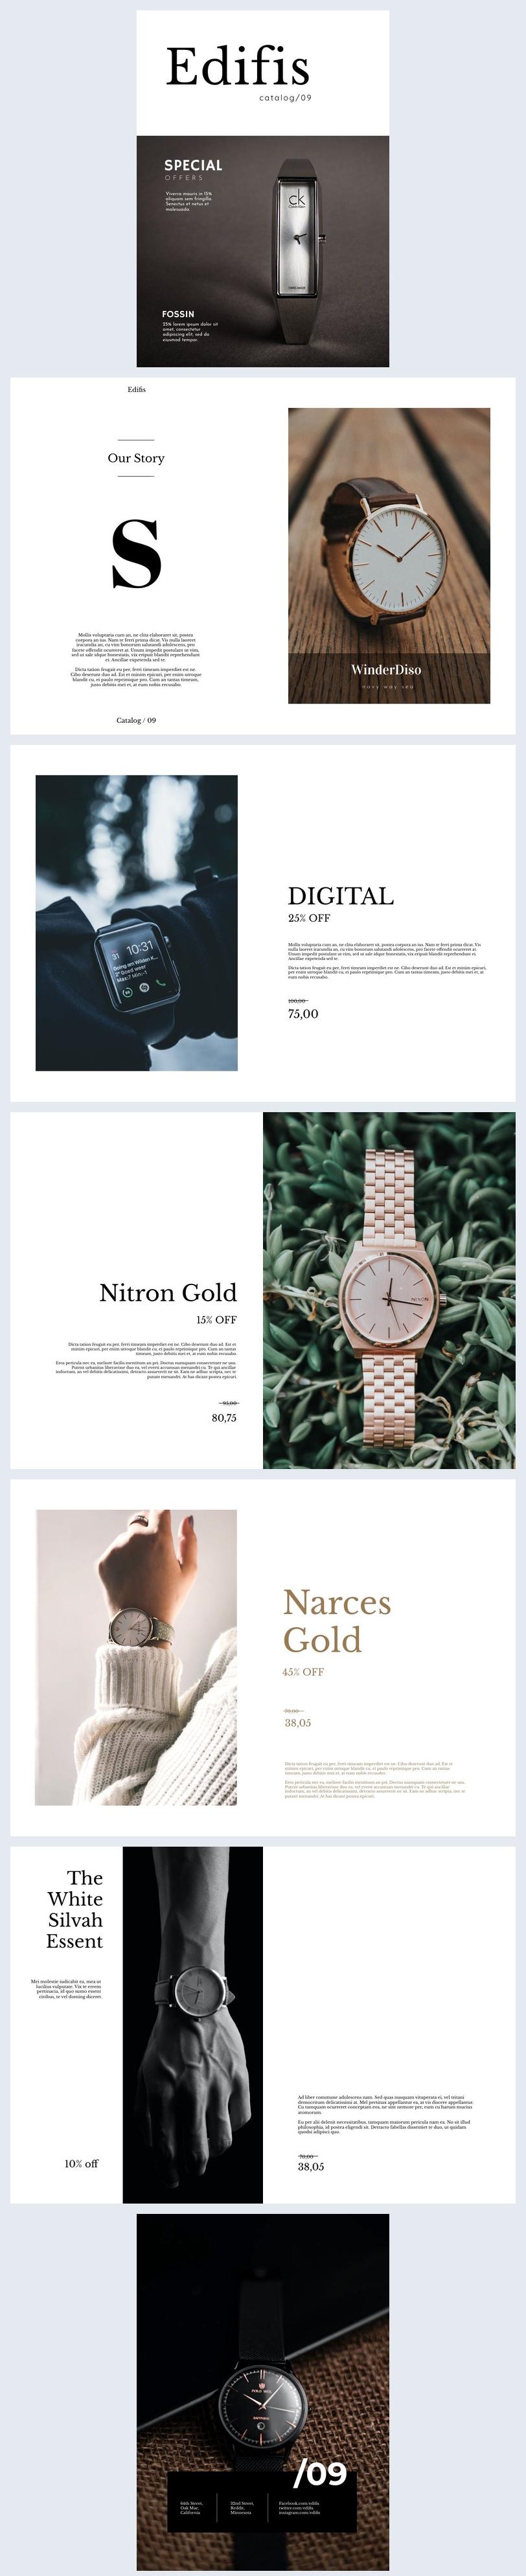 Watch Store Catalog / Brochure Design